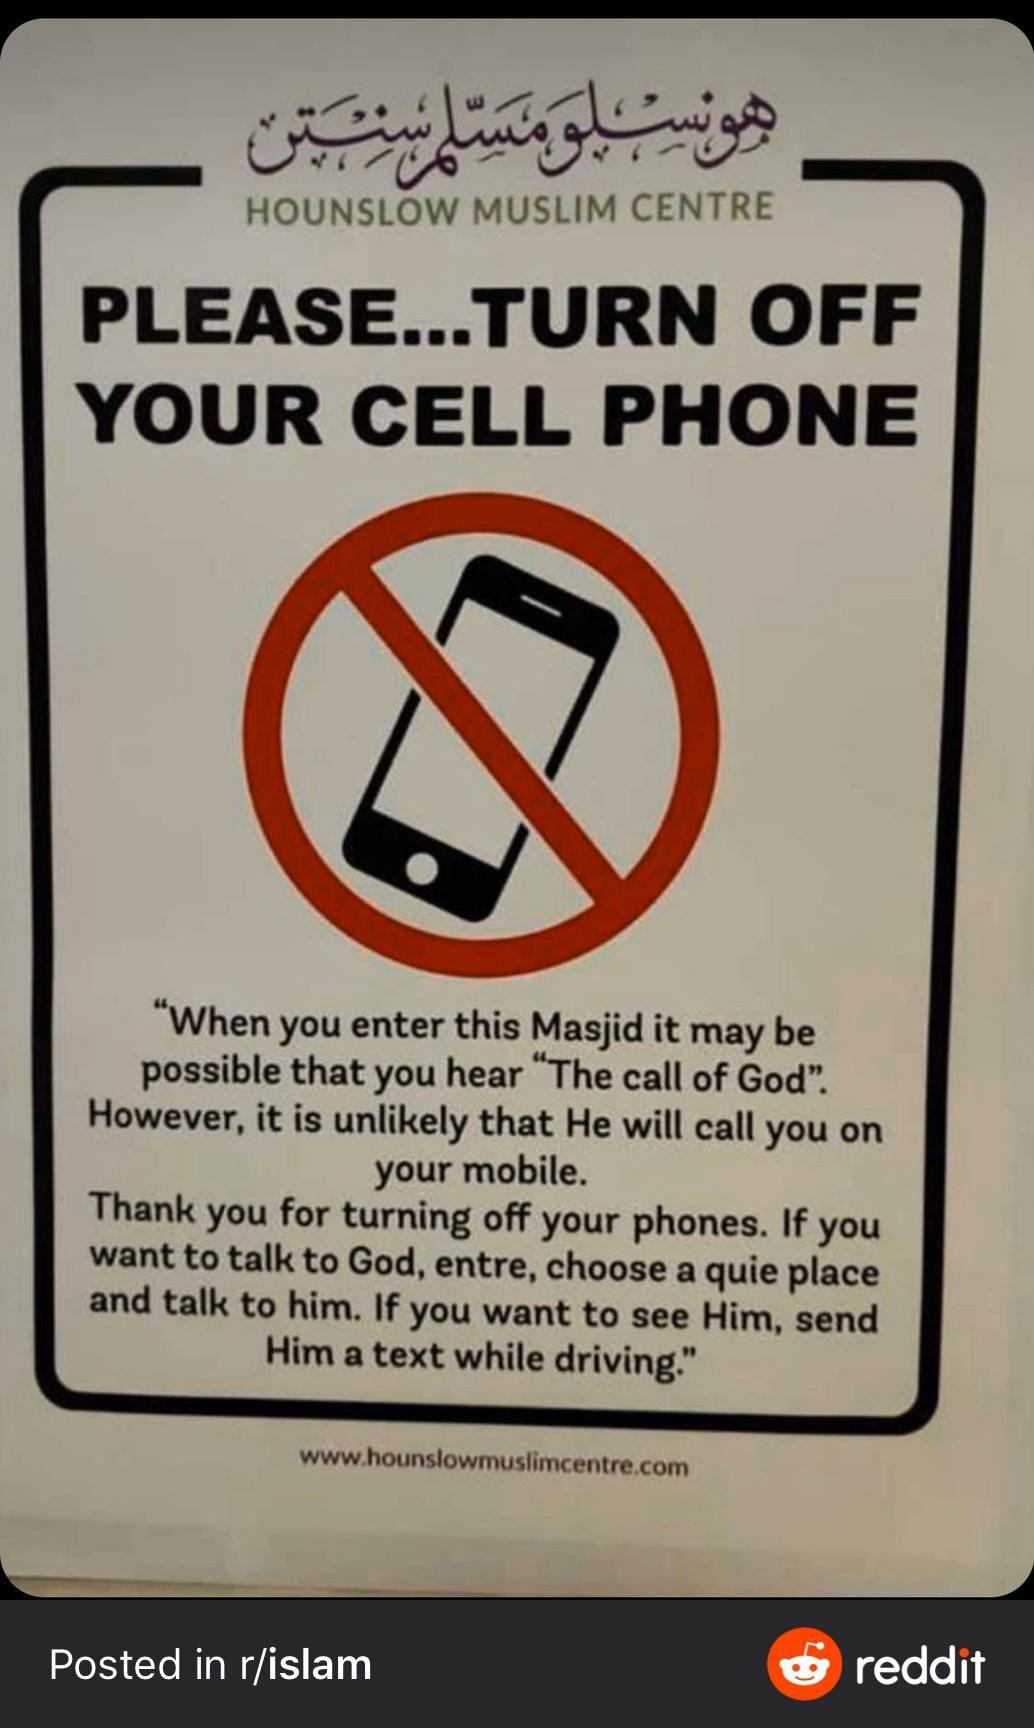 No phones, please